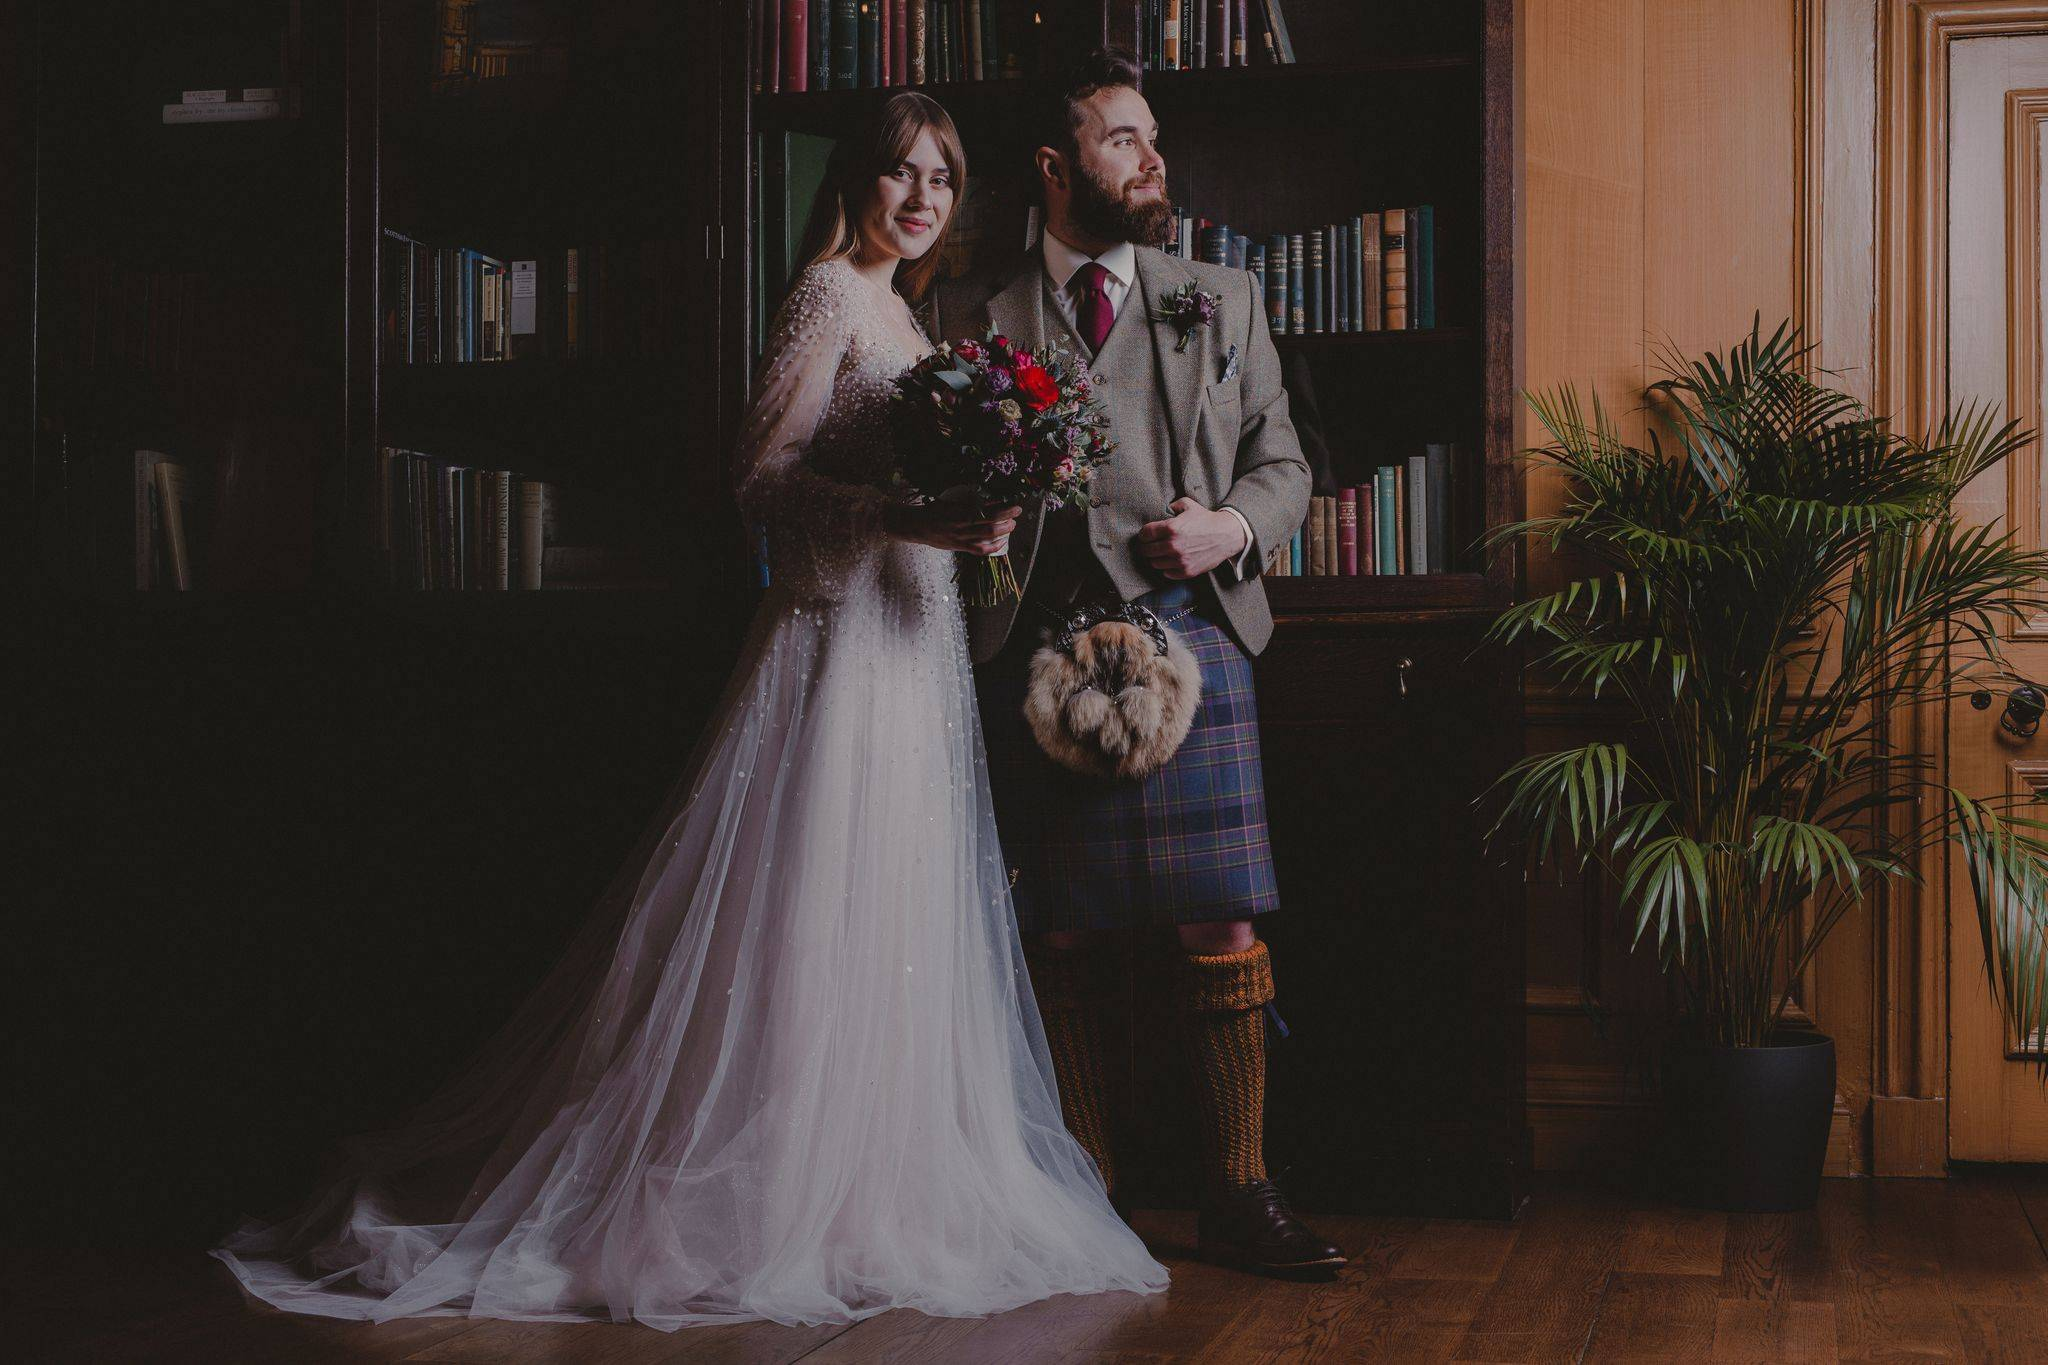 Highlandwear wedding ceremony featuring handmade GNK kilt